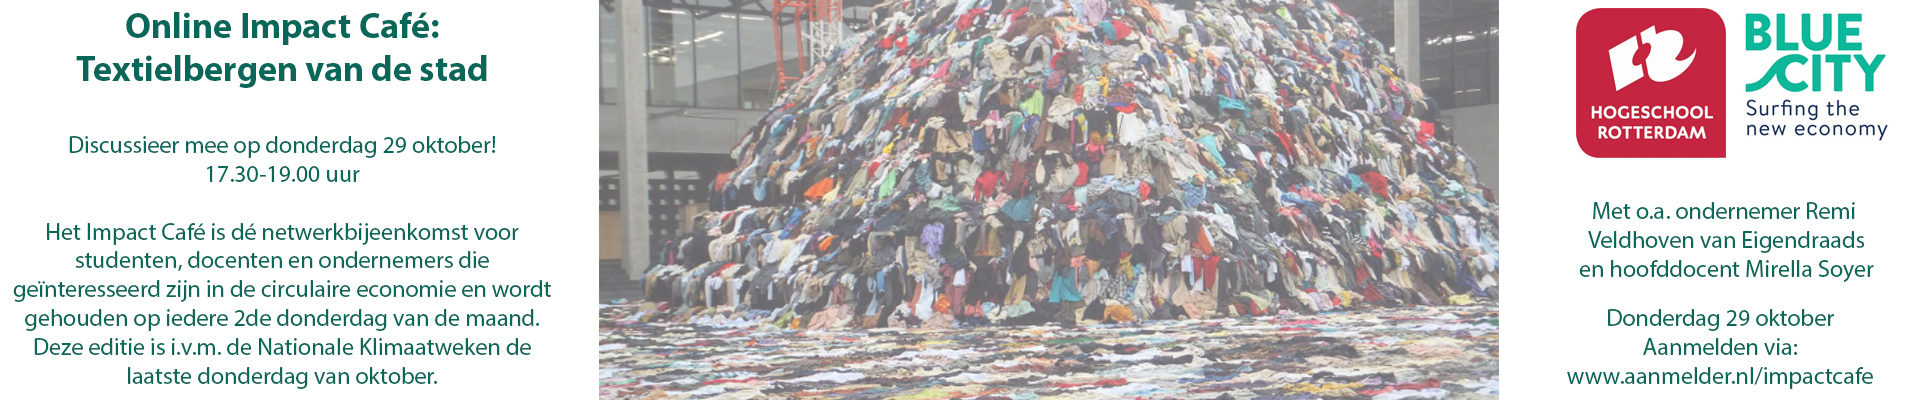 Impact Café Oktober: Textielbergen van de stad